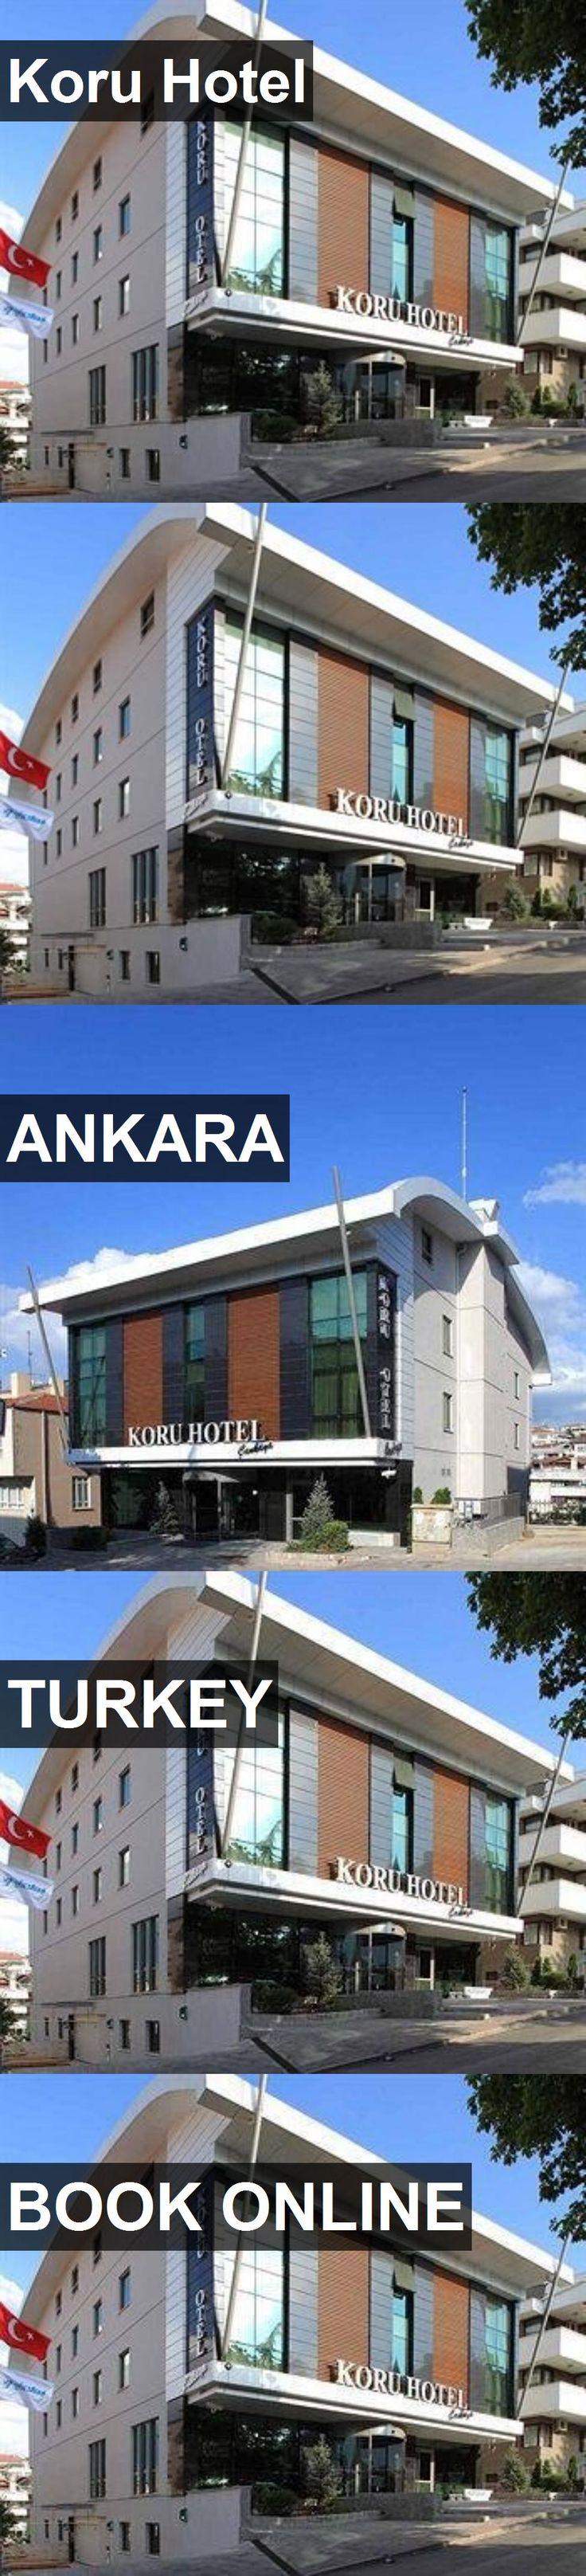 Hotel Koru Hotel in Ankara, Turkey. For more information, photos, reviews and best prices please follow the link. #Turkey #Ankara #KoruHotel #hotel #travel #vacation